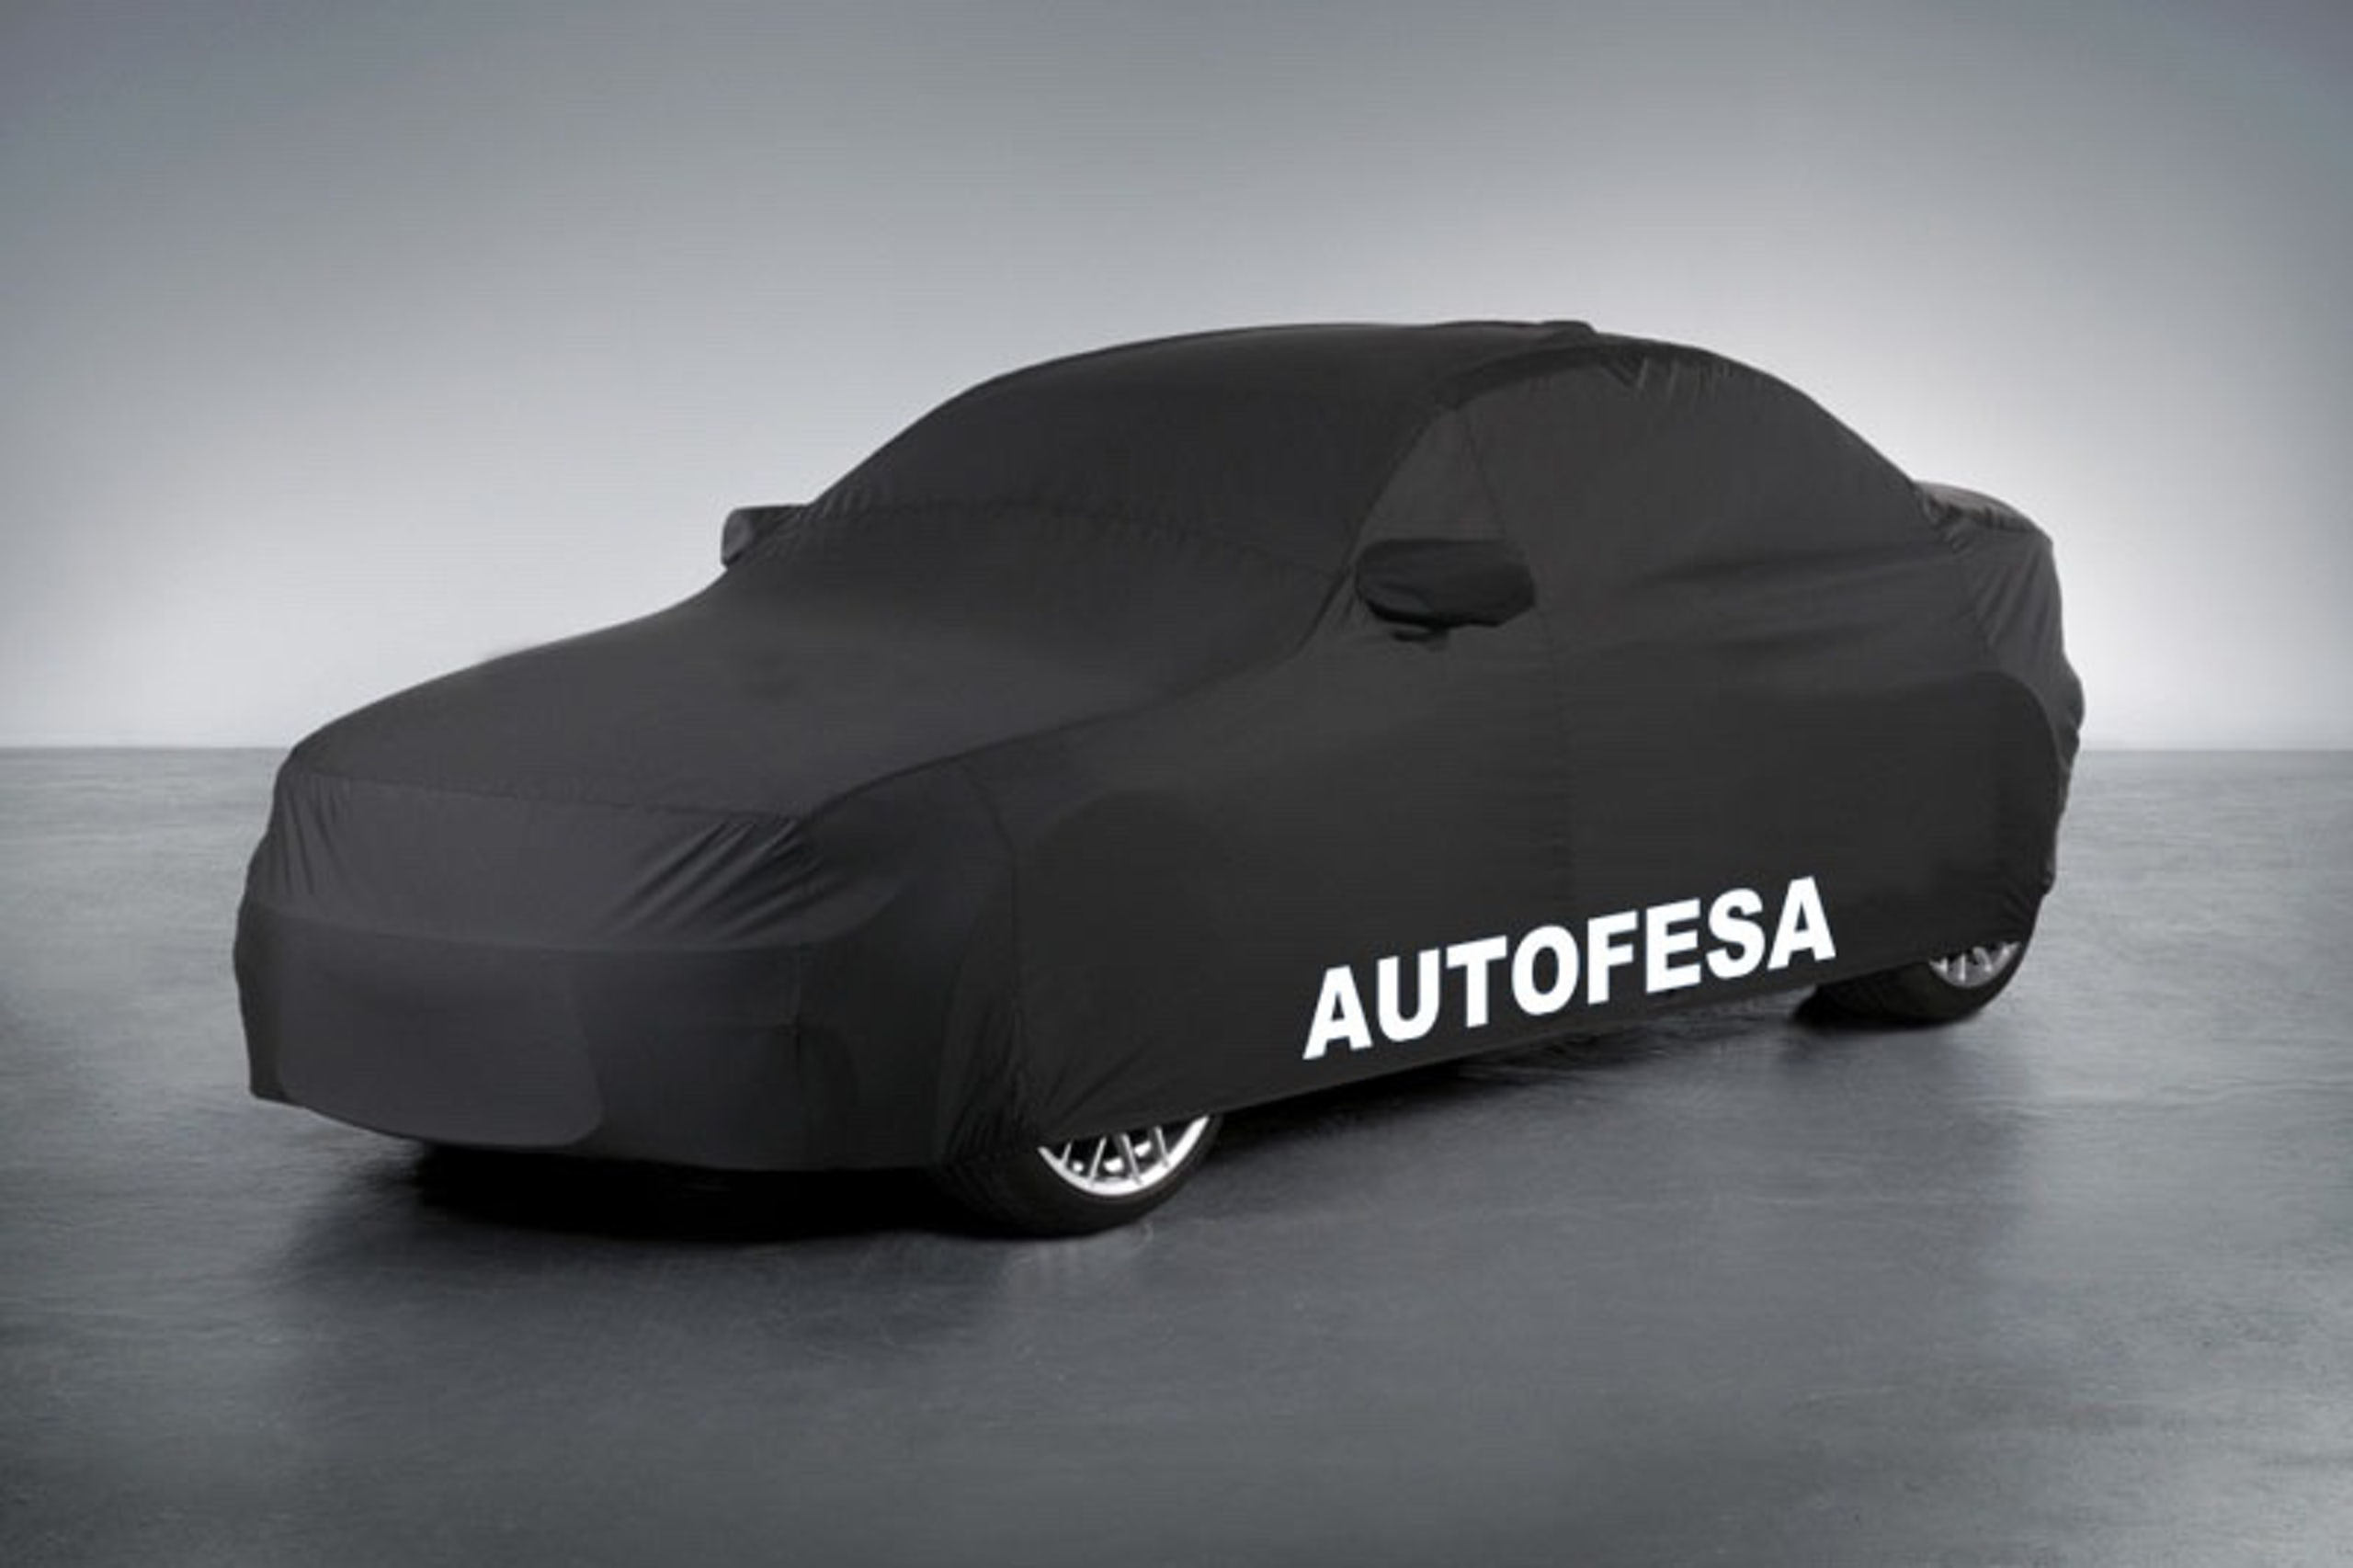 Ford Mondeo 2.0 TDCi 150cv Trend 5p Powershift Auto S/S - Foto 32